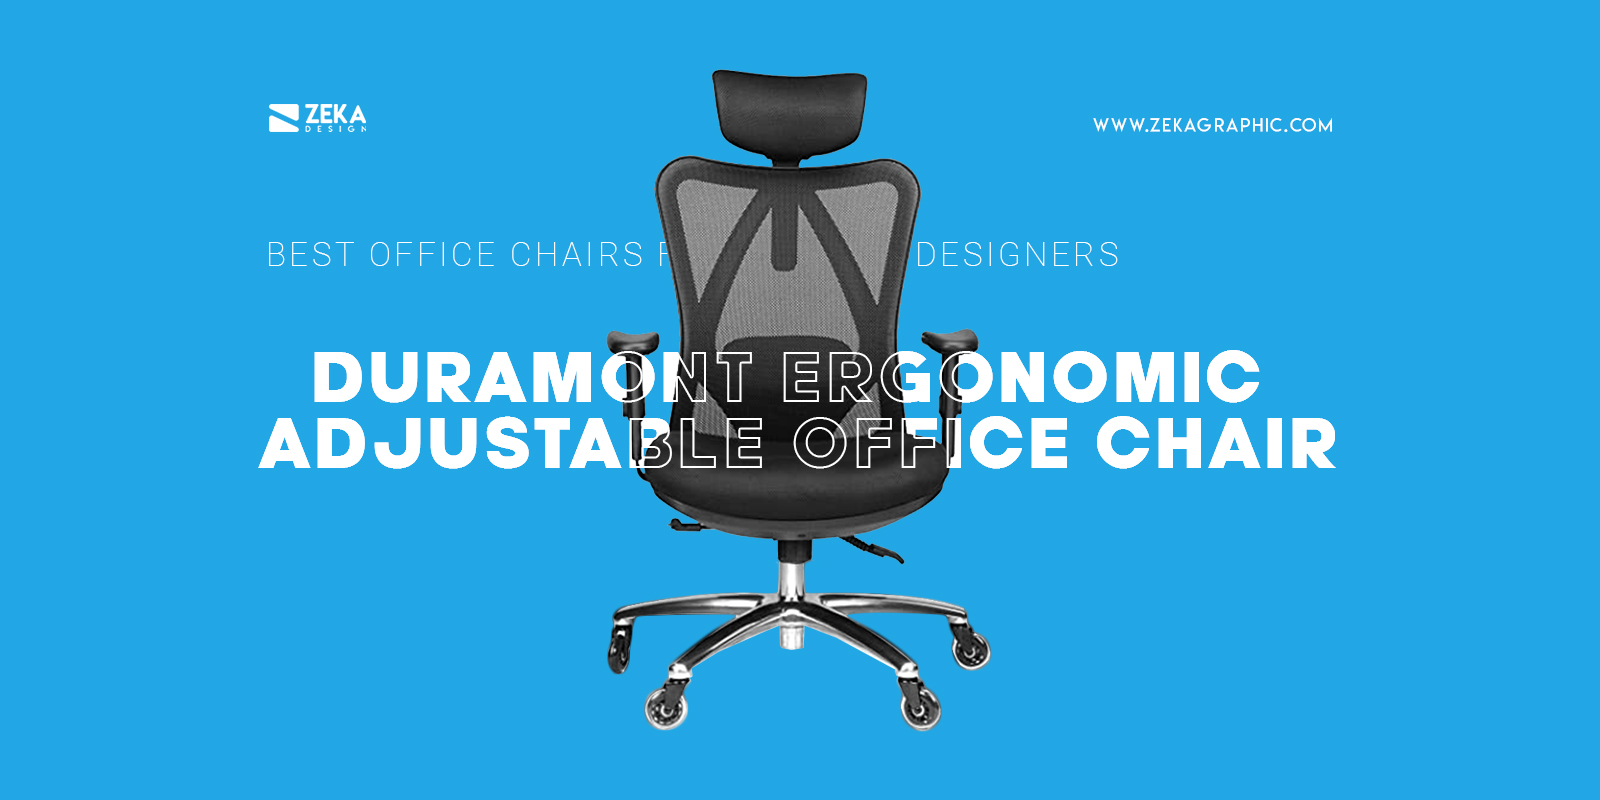 Duramont Ergonomic Adjustable Office Chair For Graphic Designers